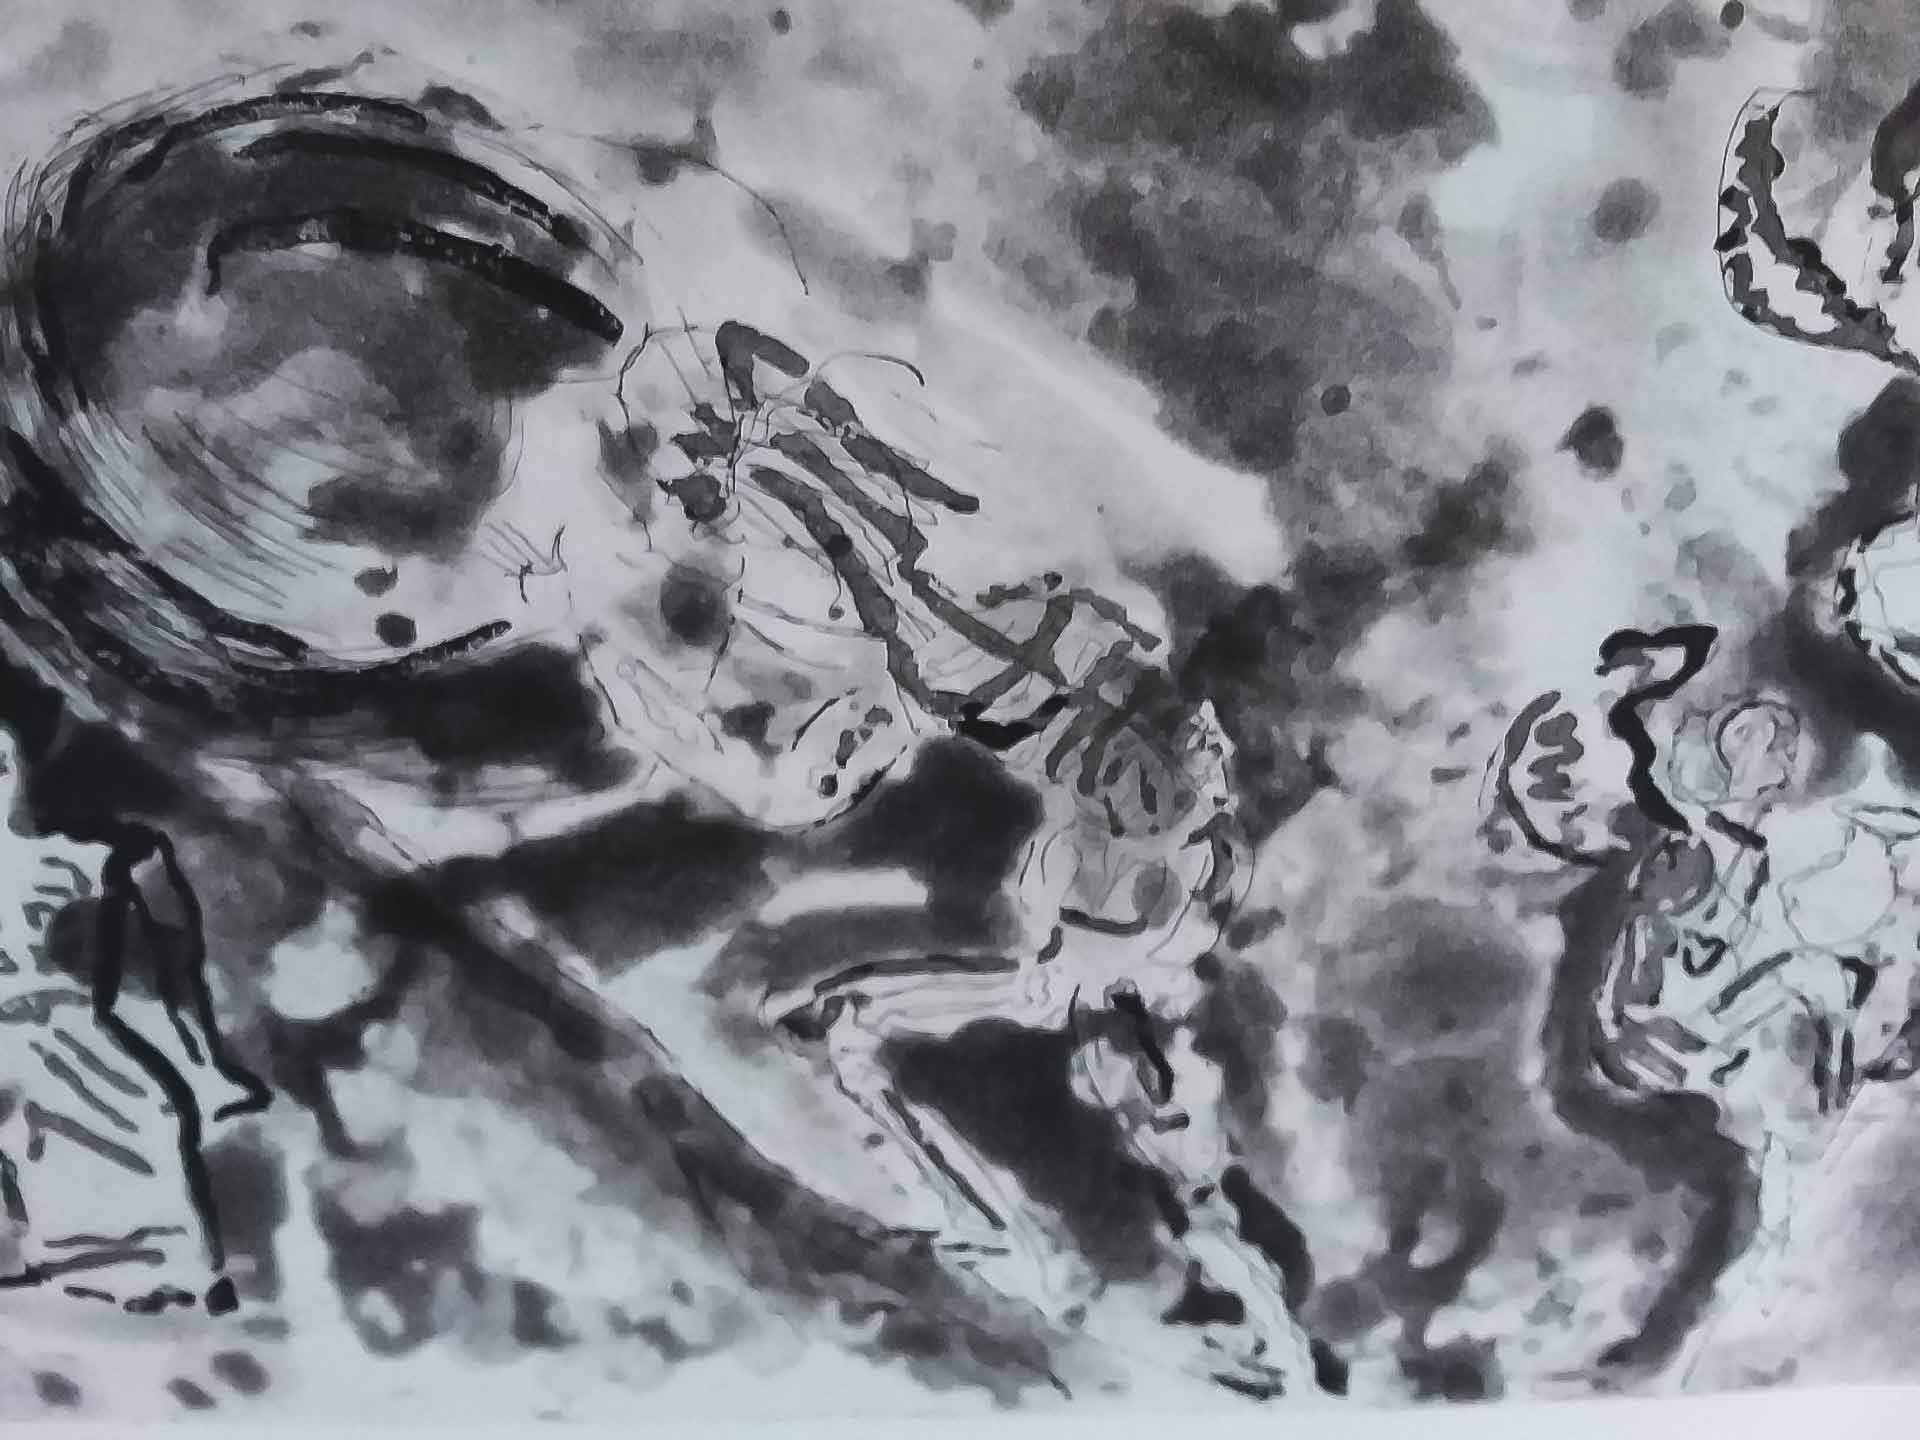 Sisyphus - 290 x 380 mm